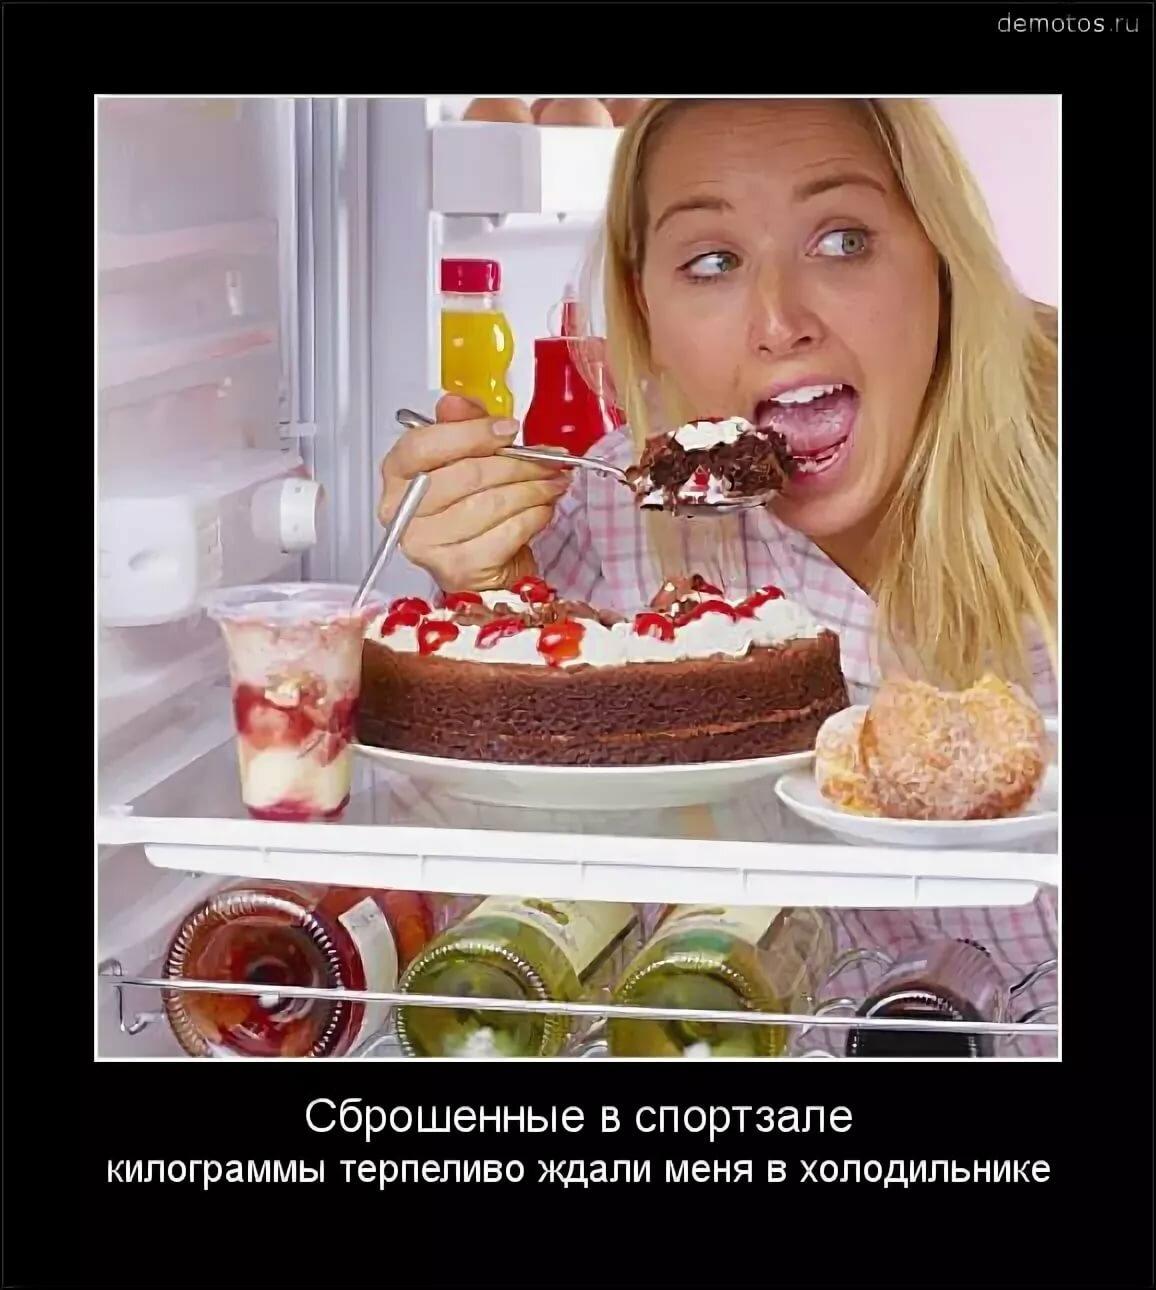 Девушки на диете смешные картинки